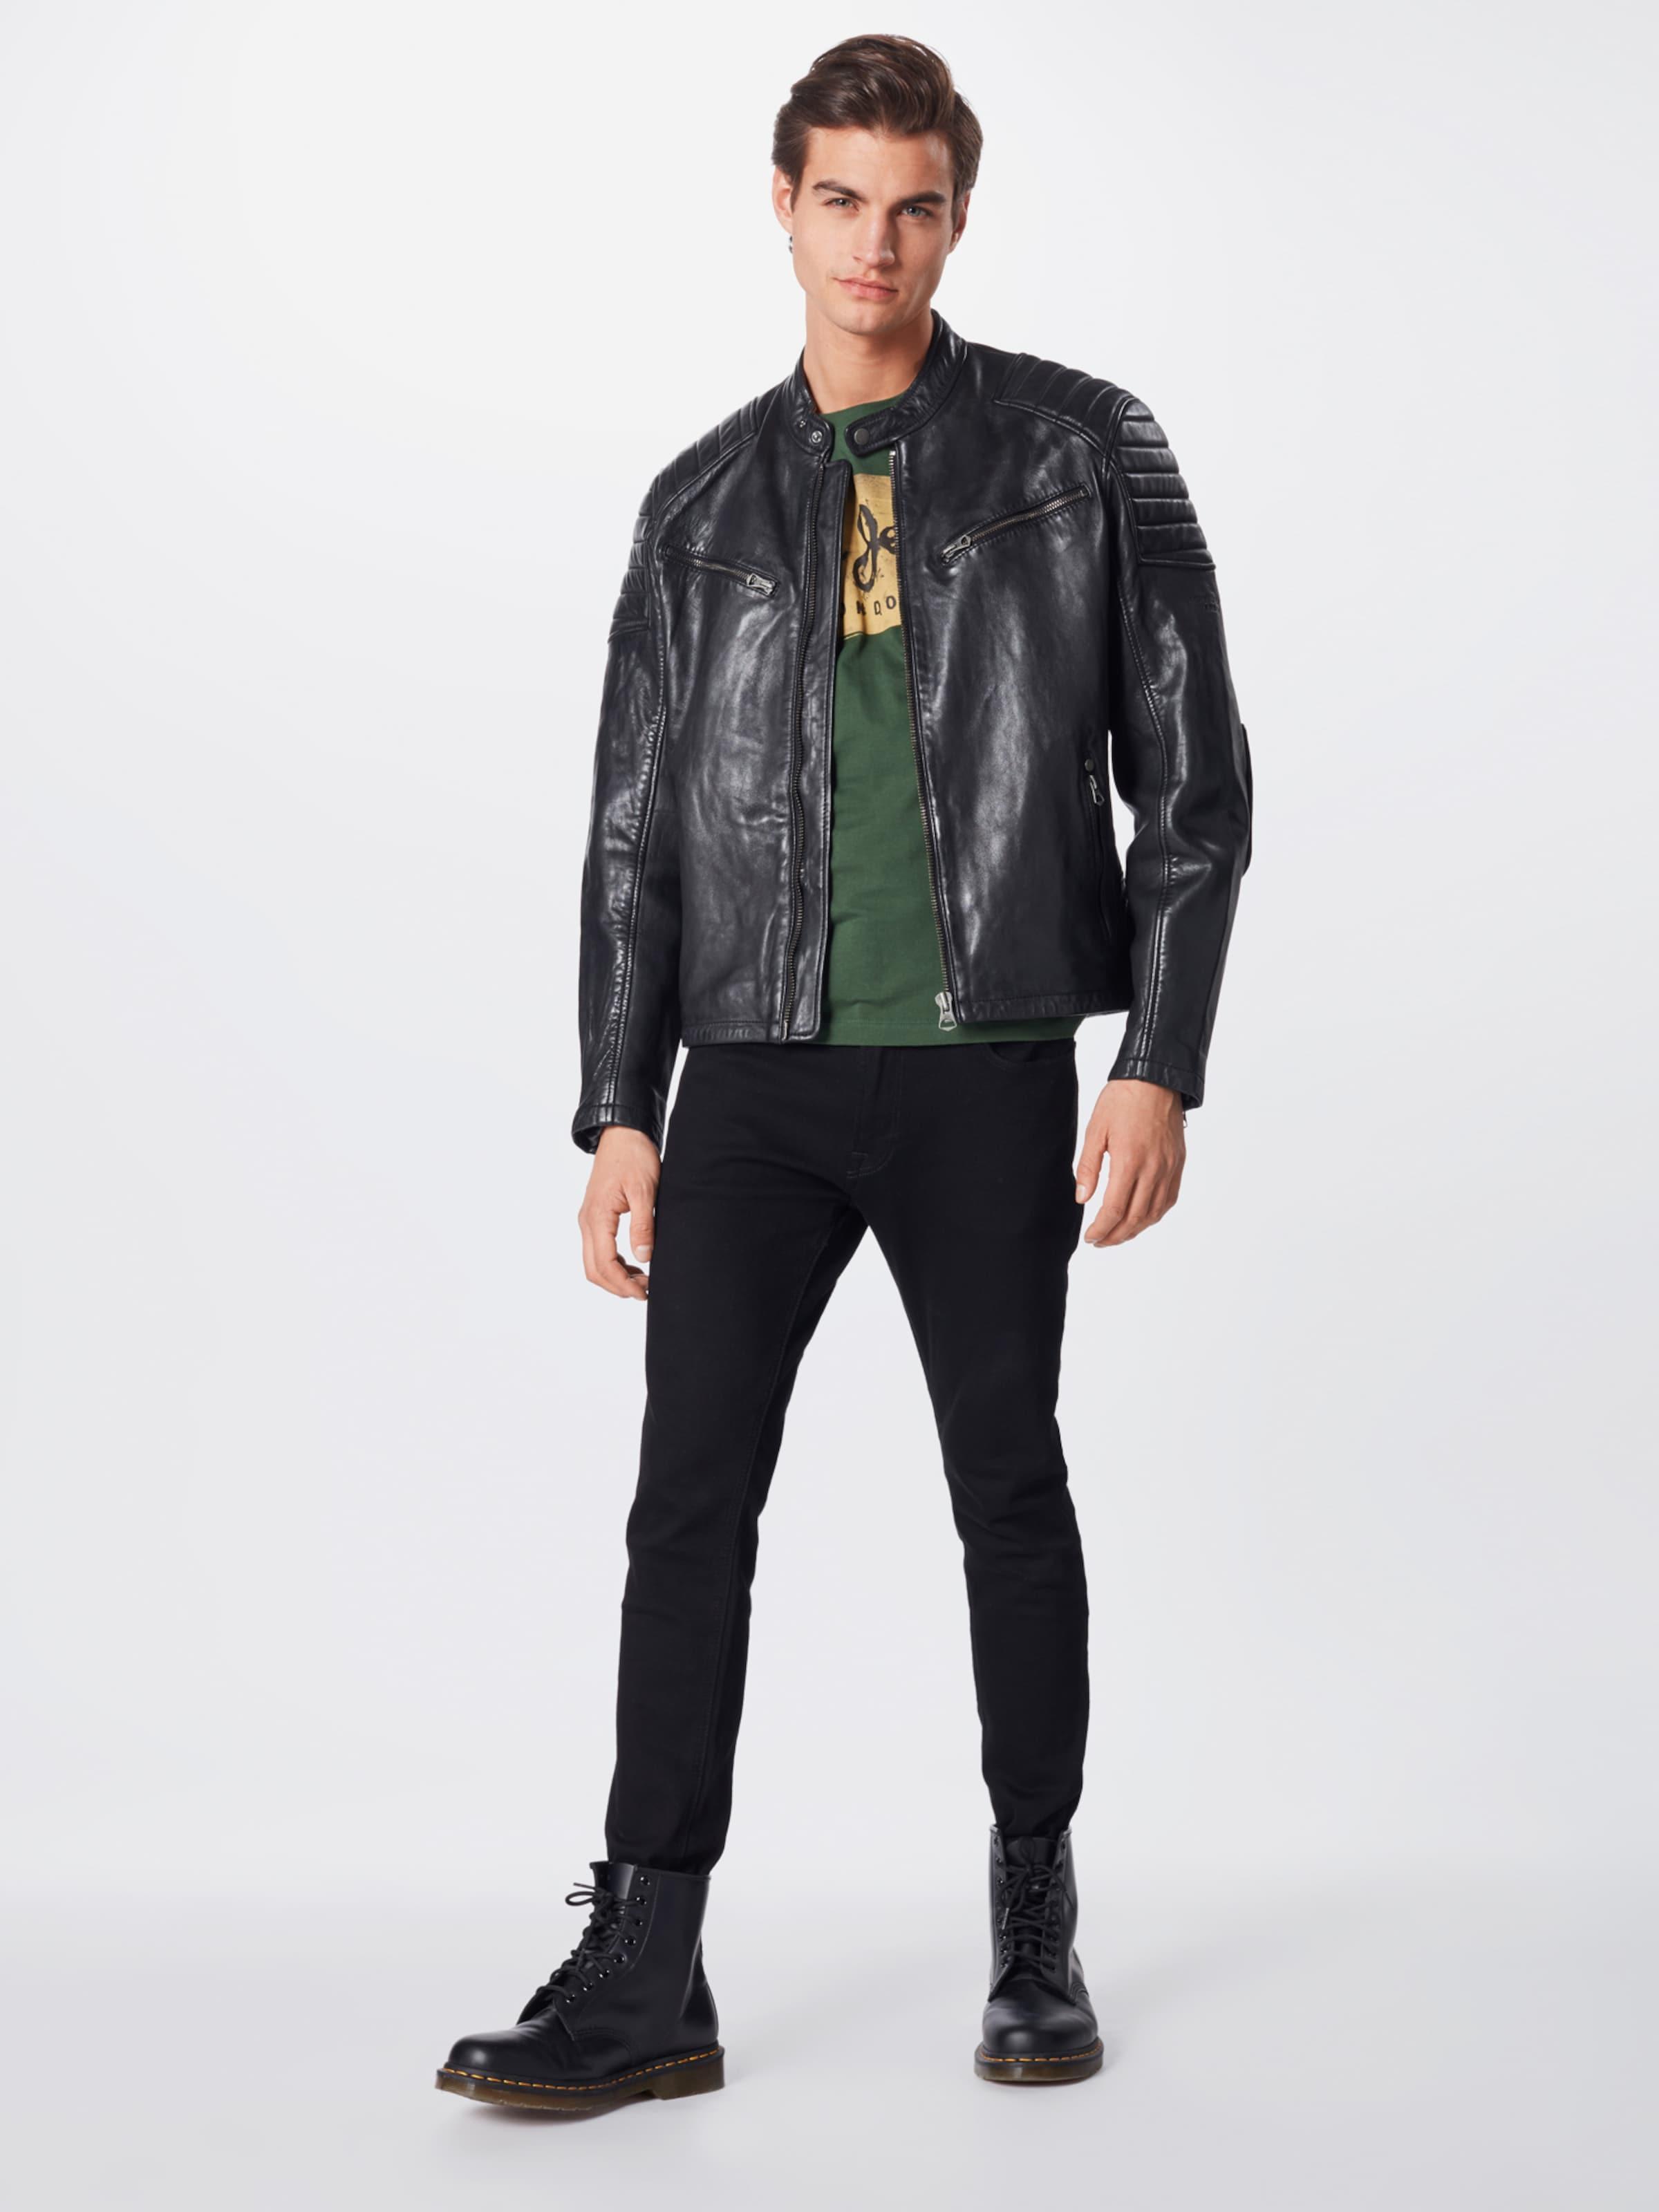 Summer' Jeans 'keith In Jacke Pepe Schwarz SMpGLVUzq